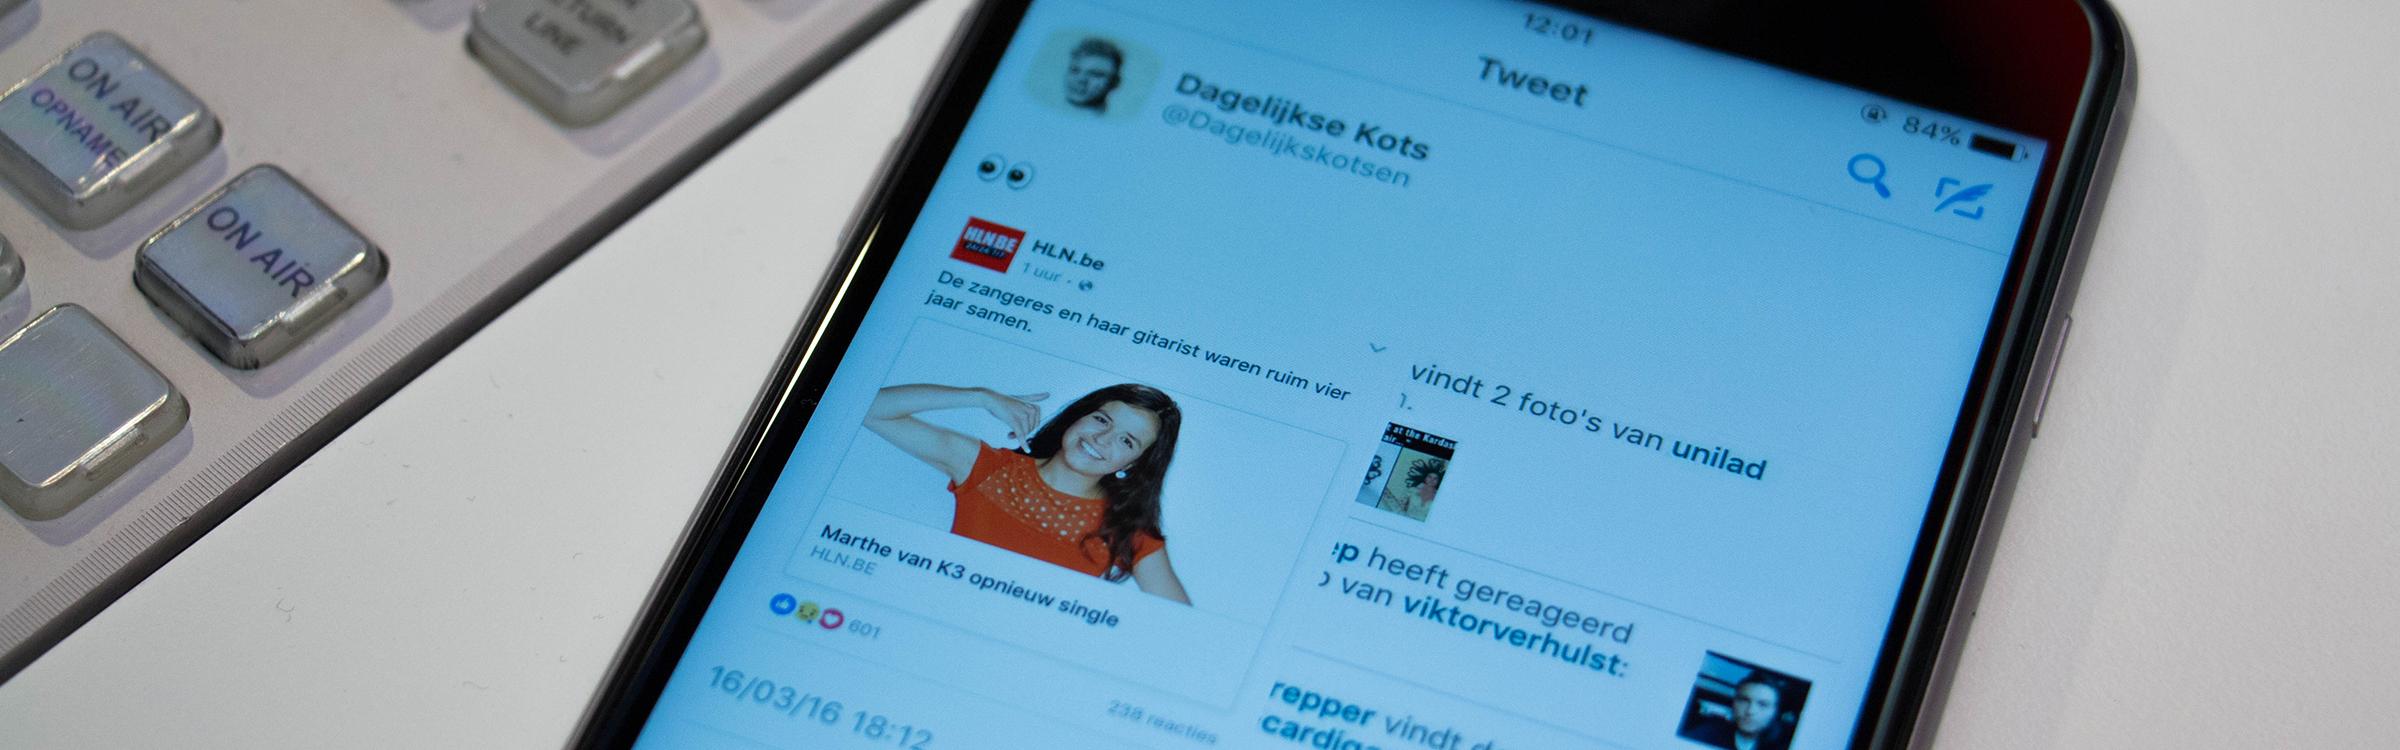 160426 twittermarthekots header